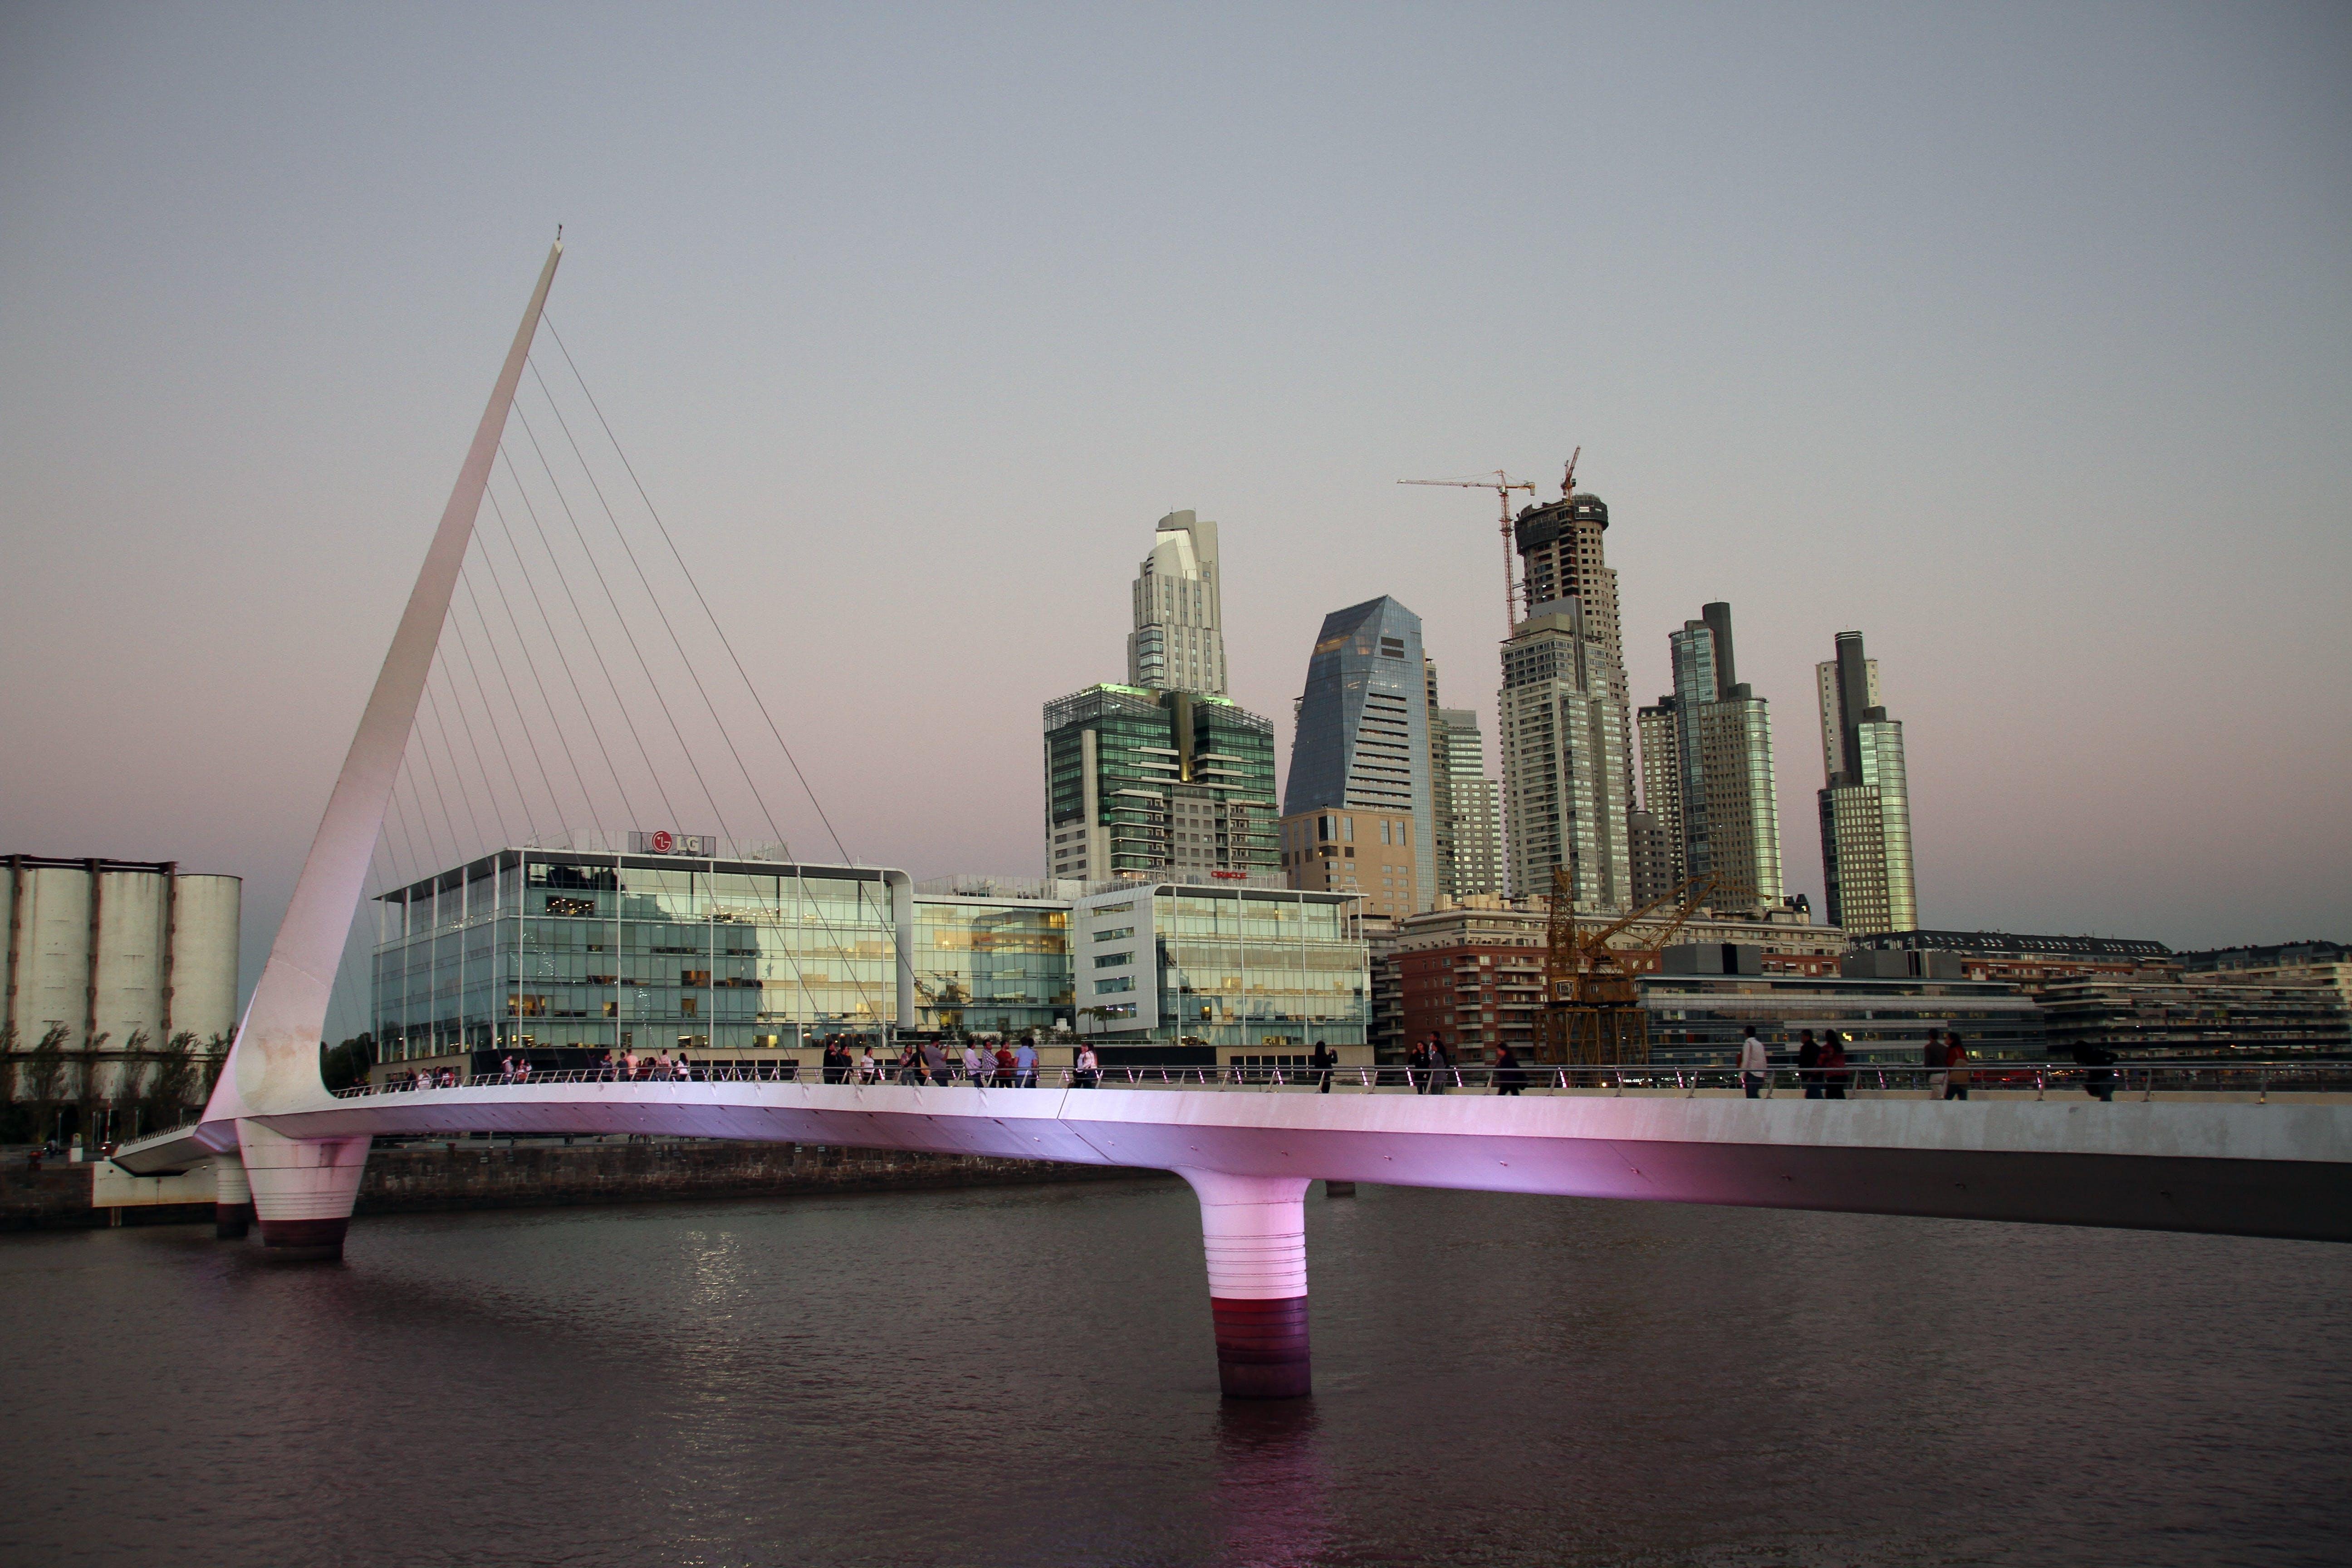 architecture, bridge, buildings